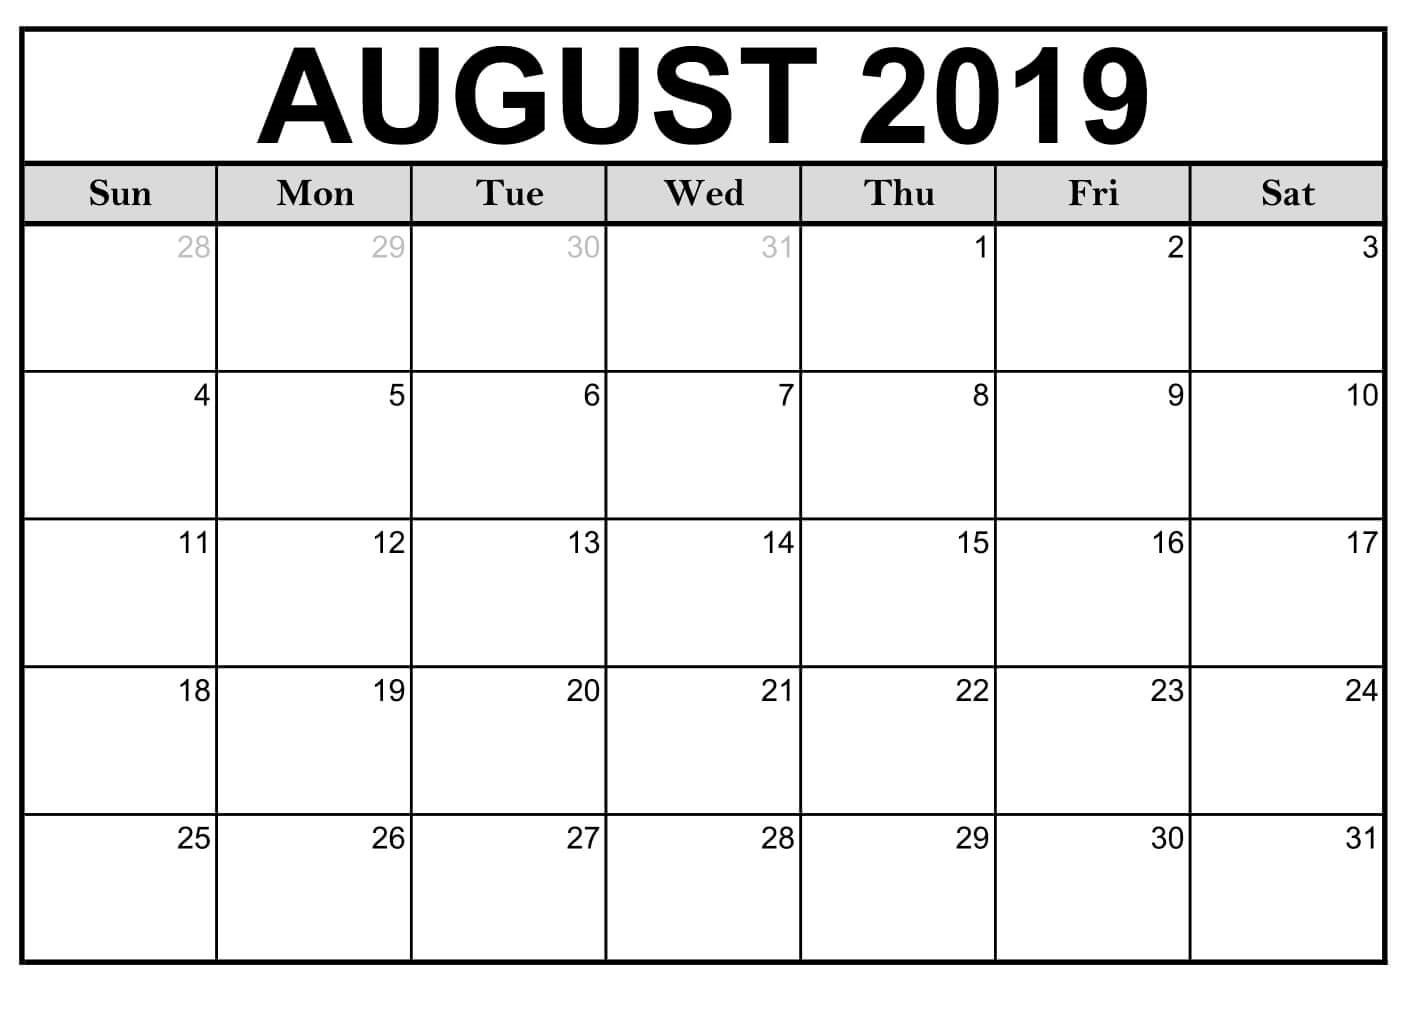 Blank August 2019 Calendar Page - Free Printable Calendar & Template August 1 2019 Calendar